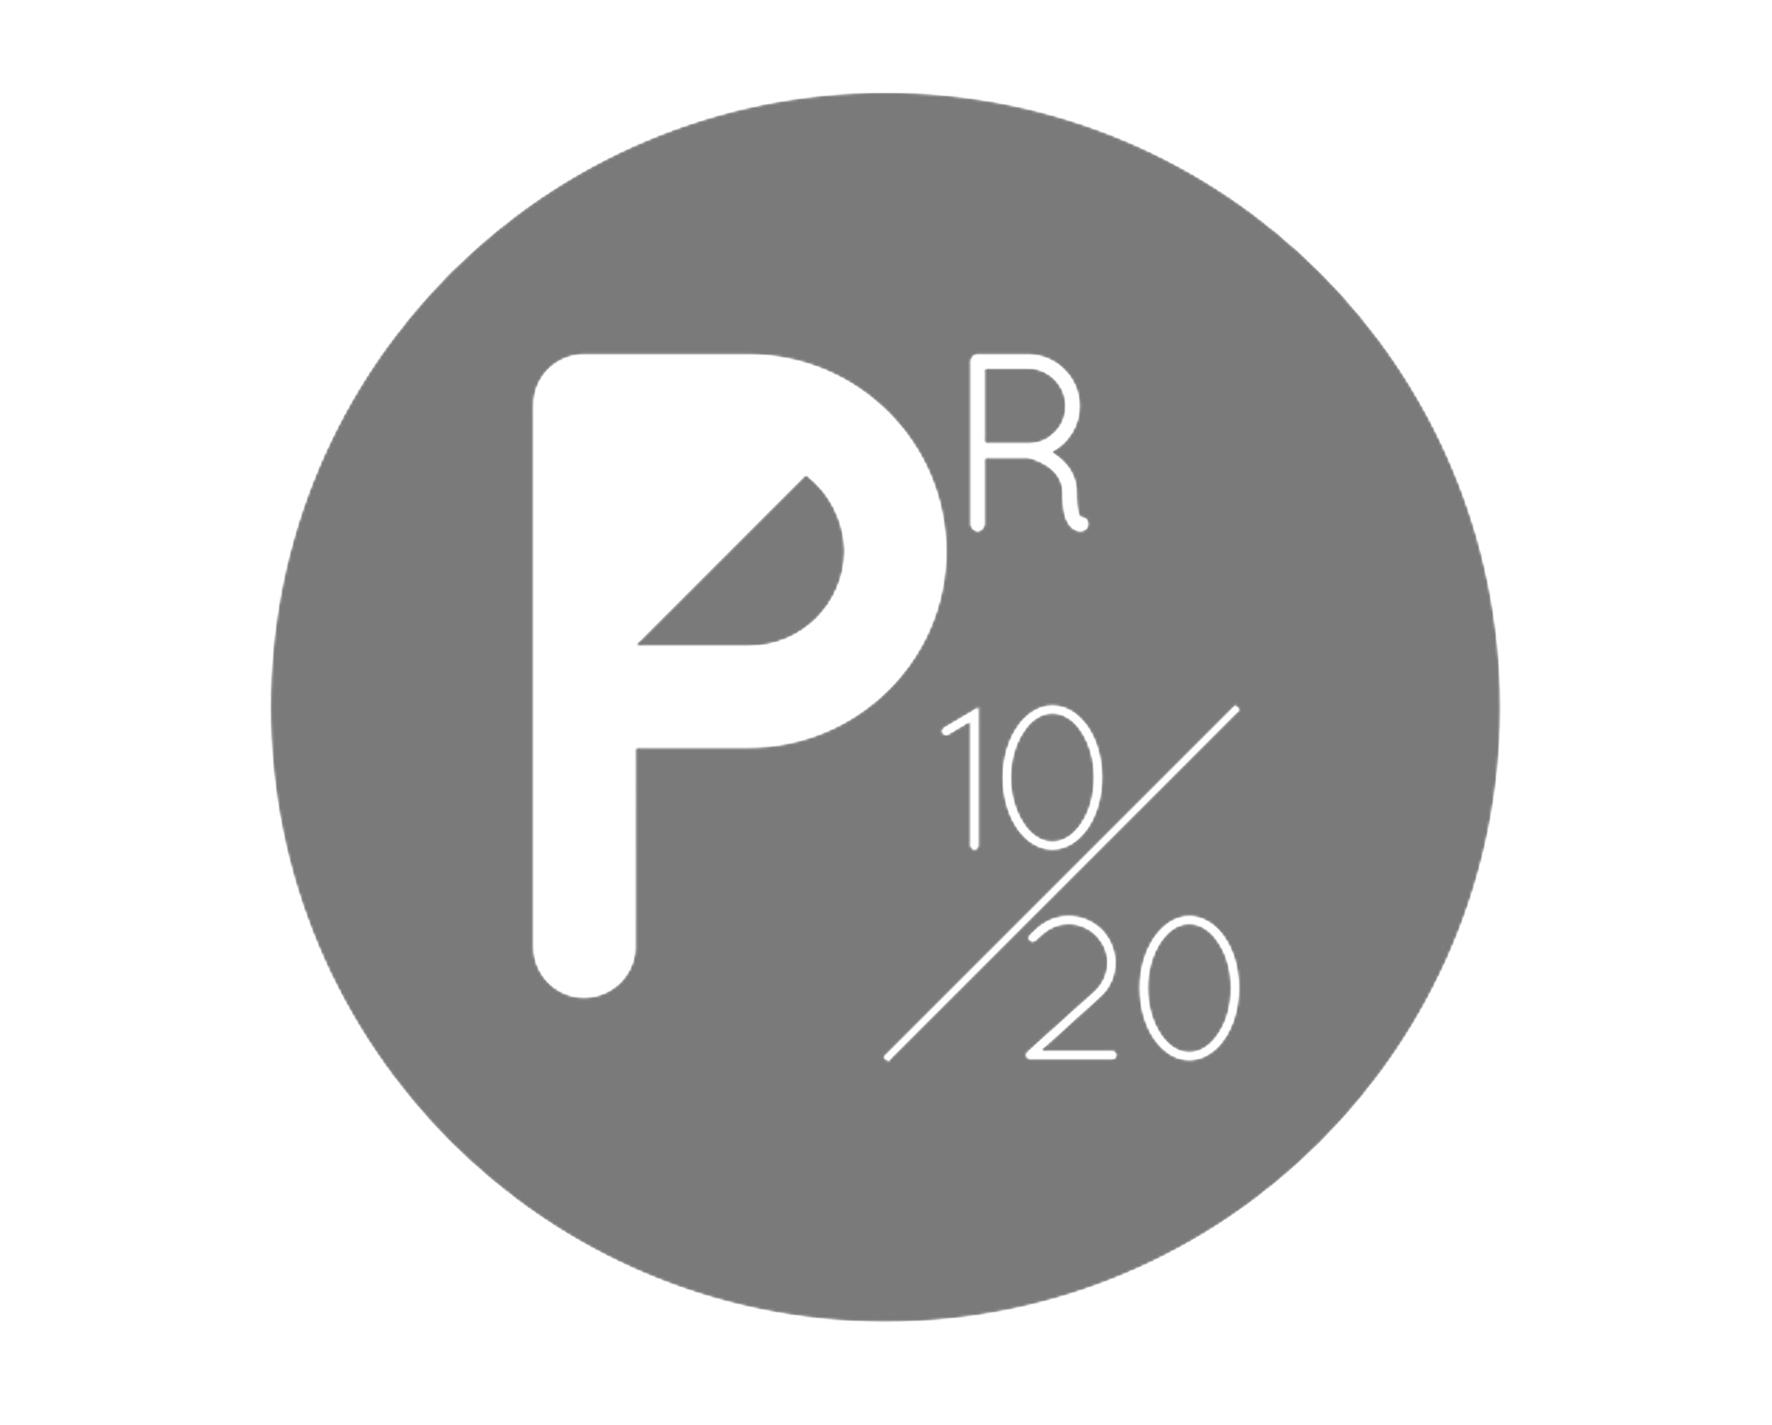 PR10/20